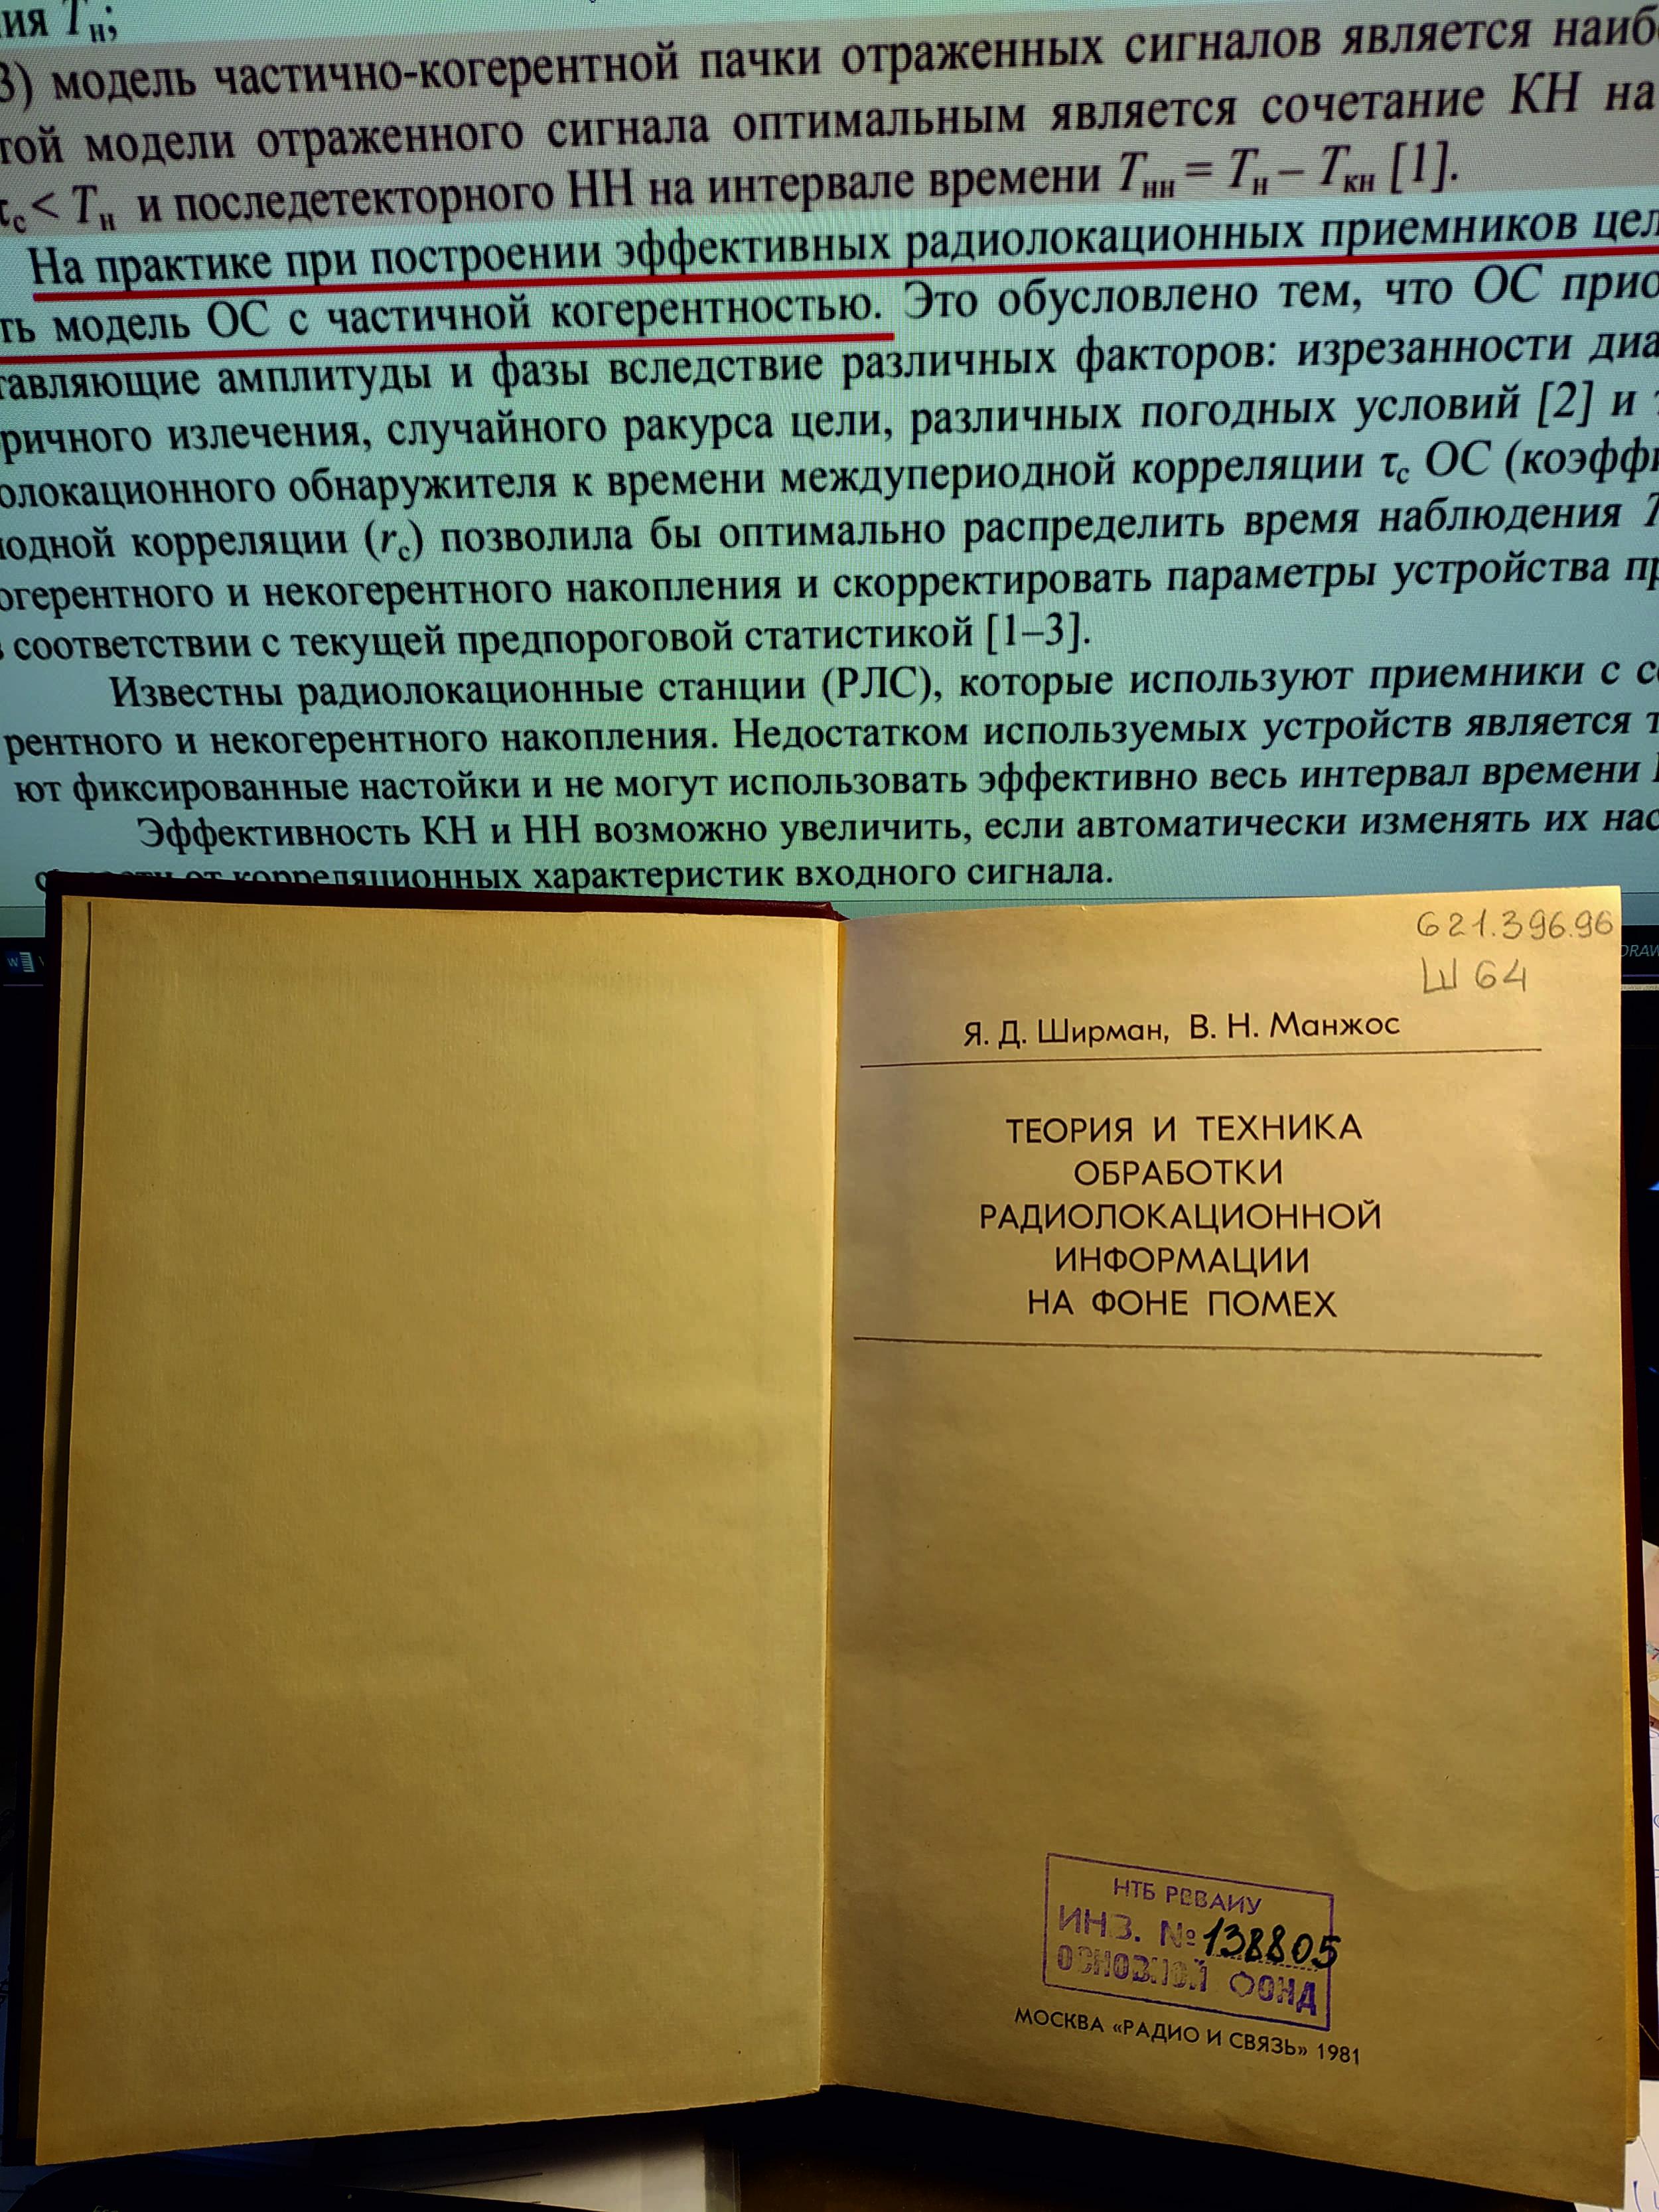 http://images.vfl.ru/ii/1614521057/bb0ca7e4/33505206.jpg